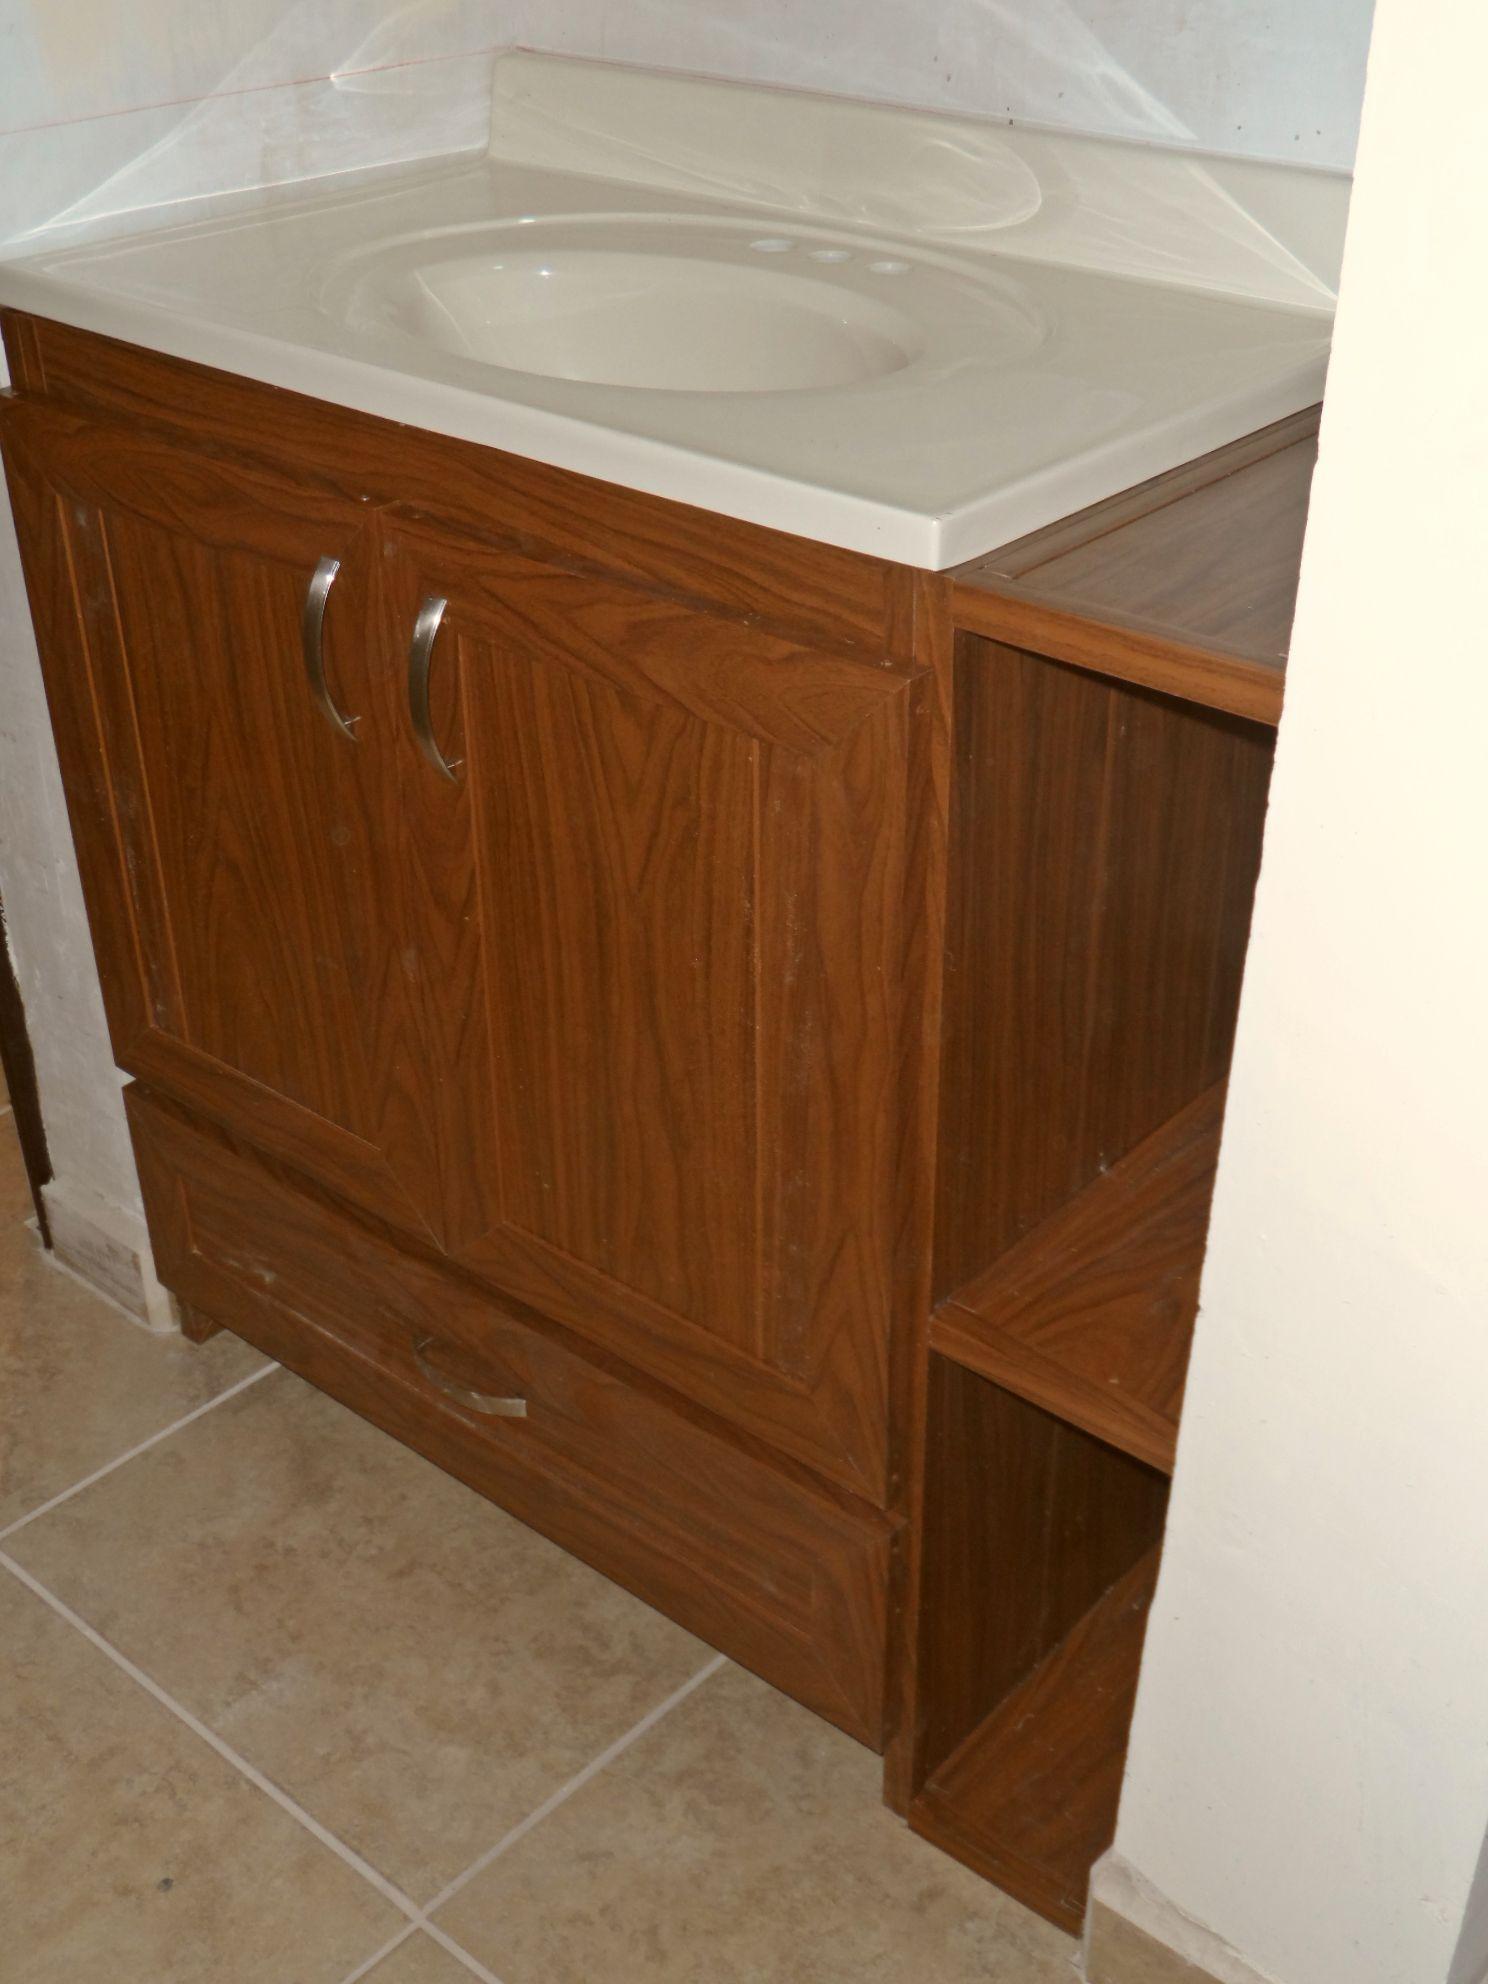 Picture of: Plastic Bathroom Cabinets Rigid Plastic Kitchen Cabinets